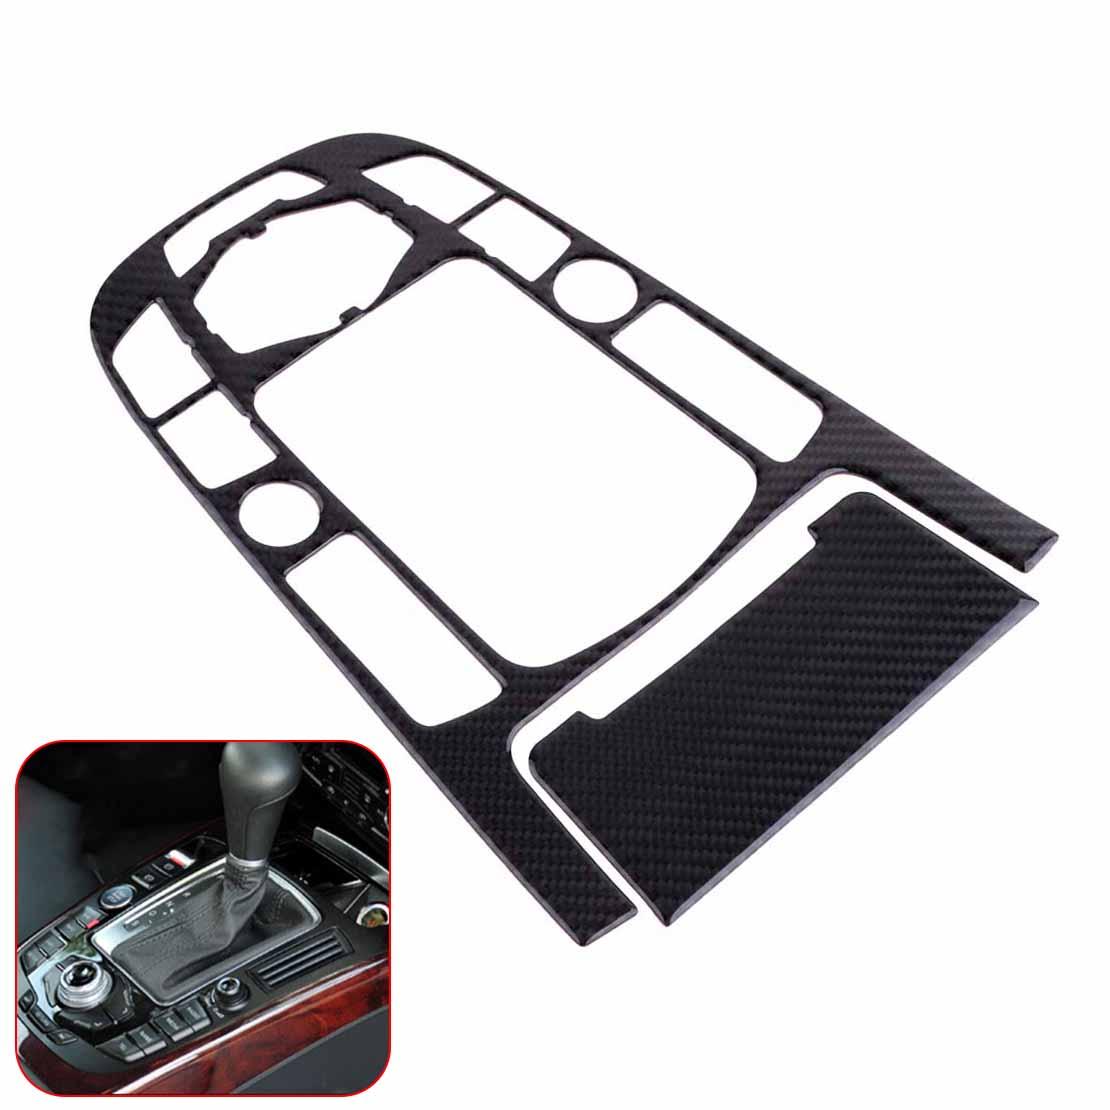 DWCX Carbon Fiber Strip Gear Shift Panel Cover Trim Car Interior Control Center Decorative Frame Molding